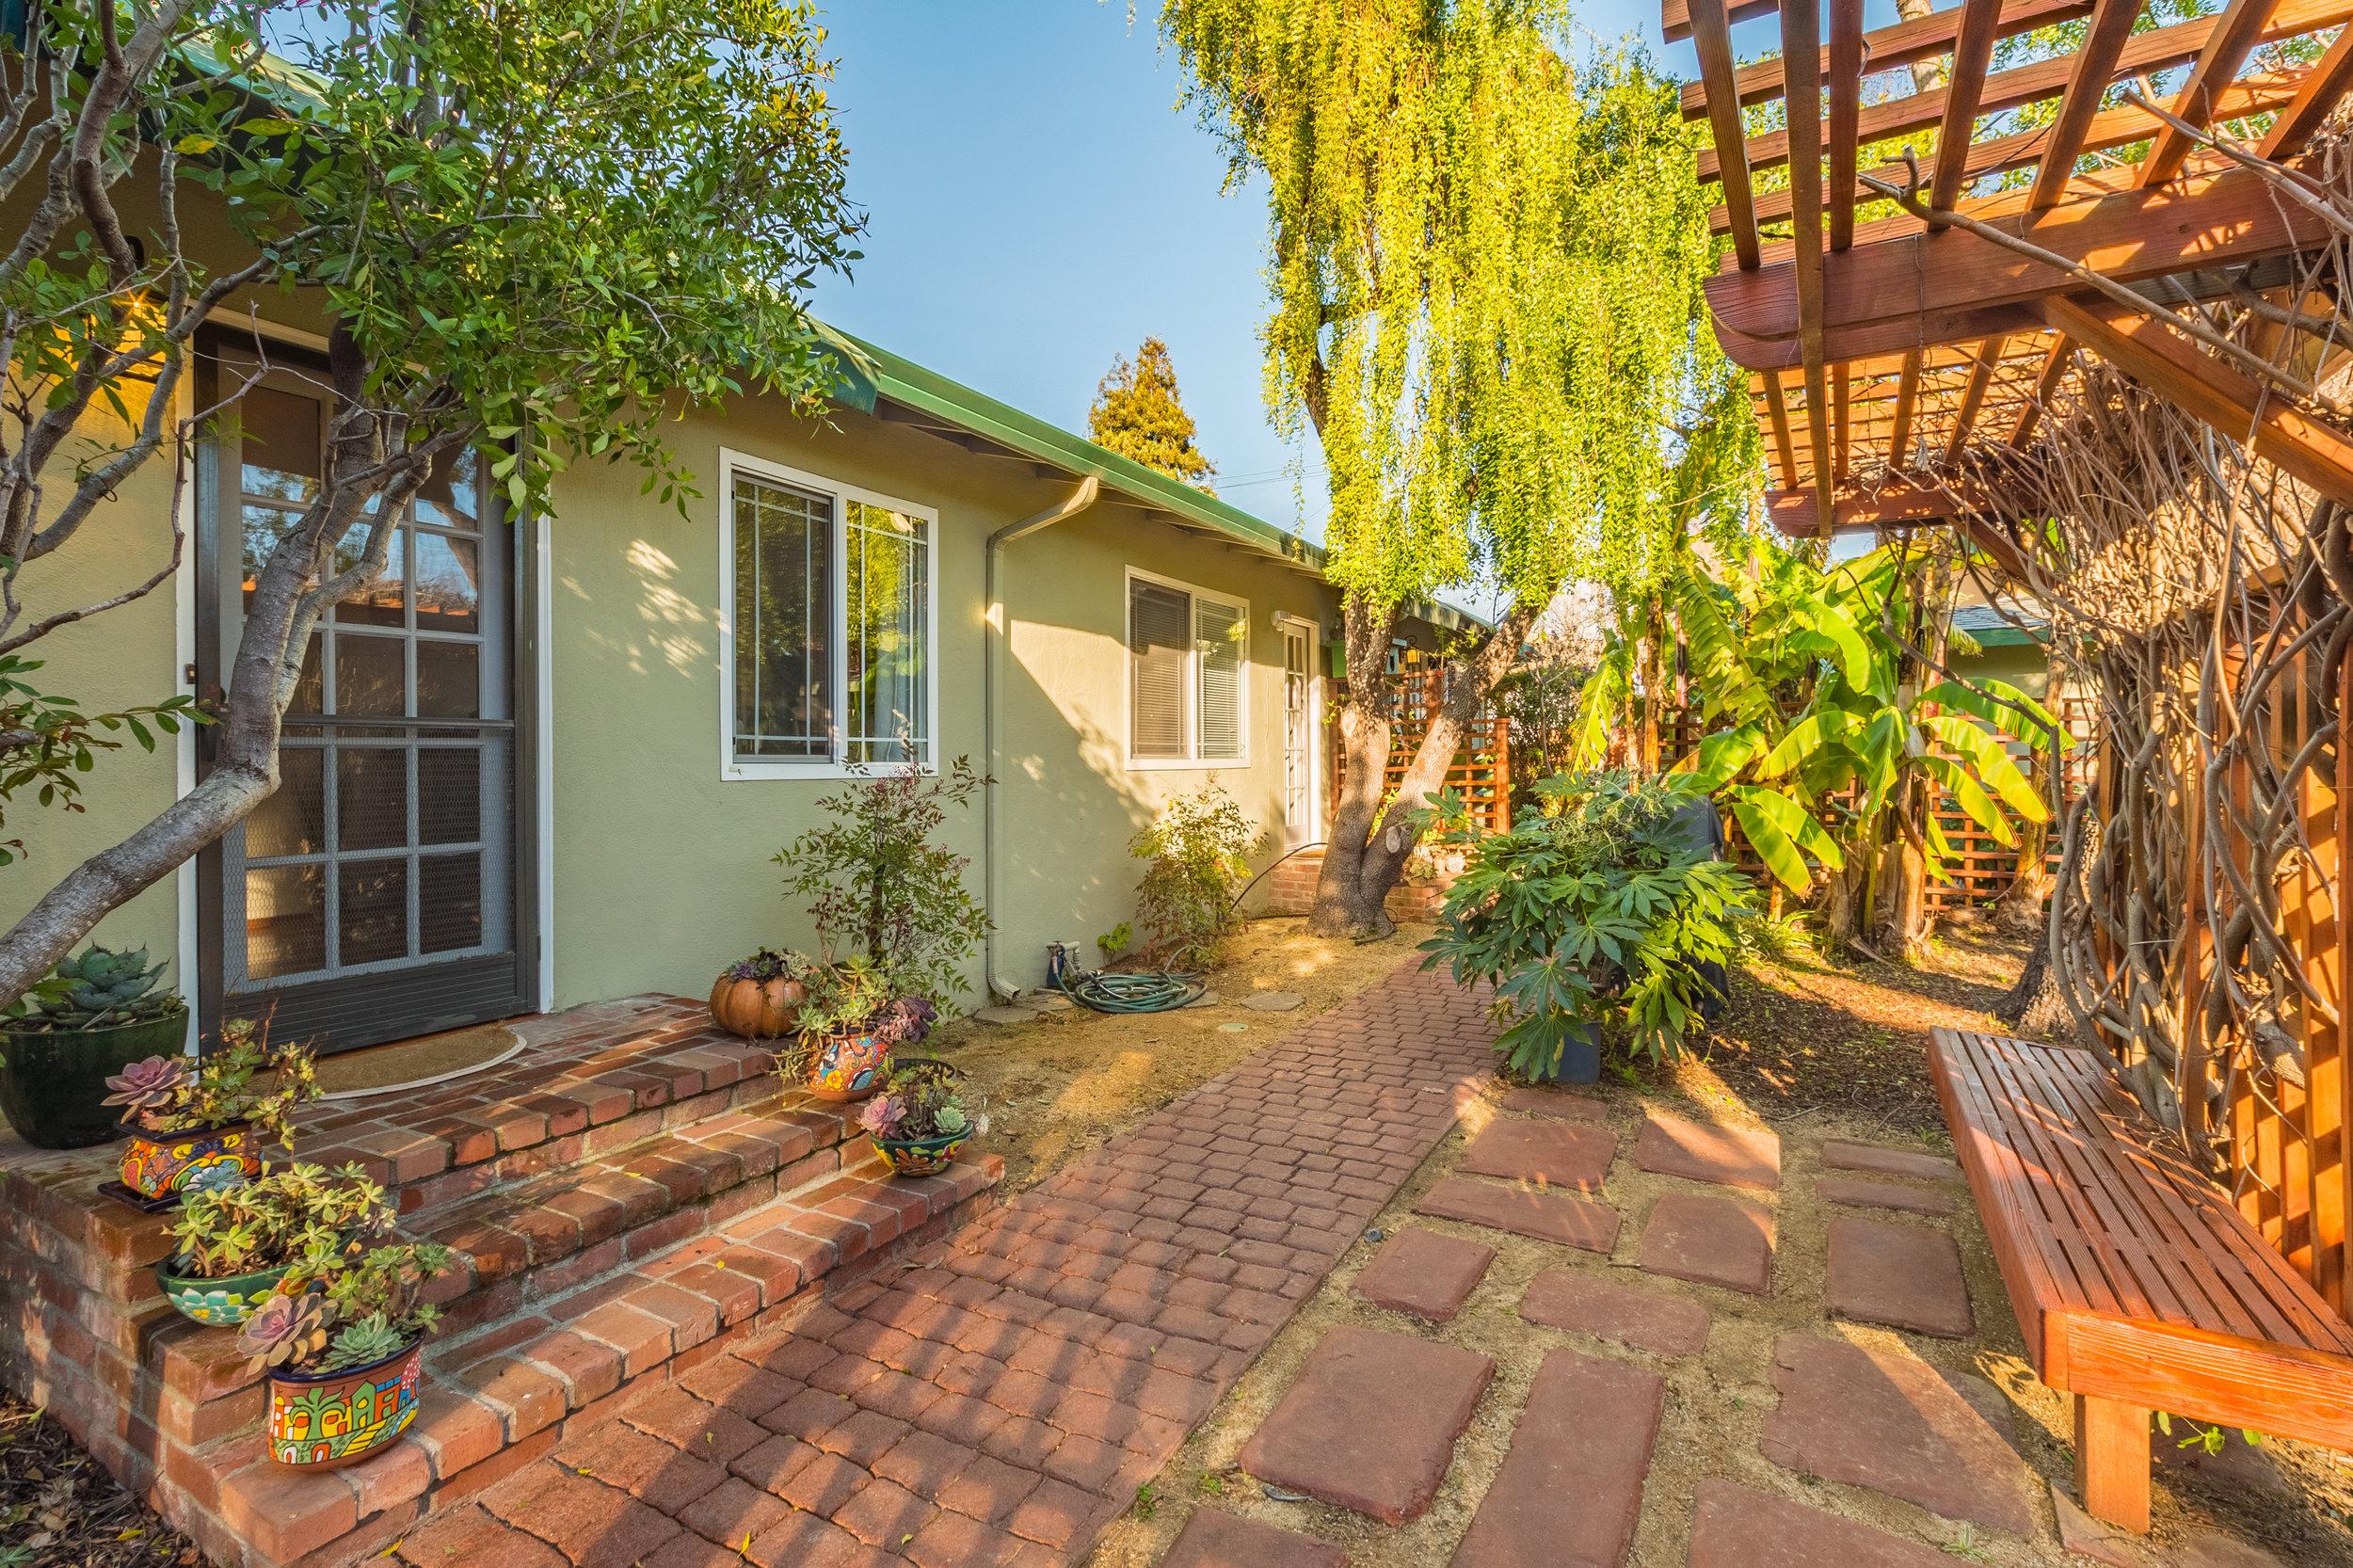 Sunny Patio Real Estate Agent Santa Cruz.jpg